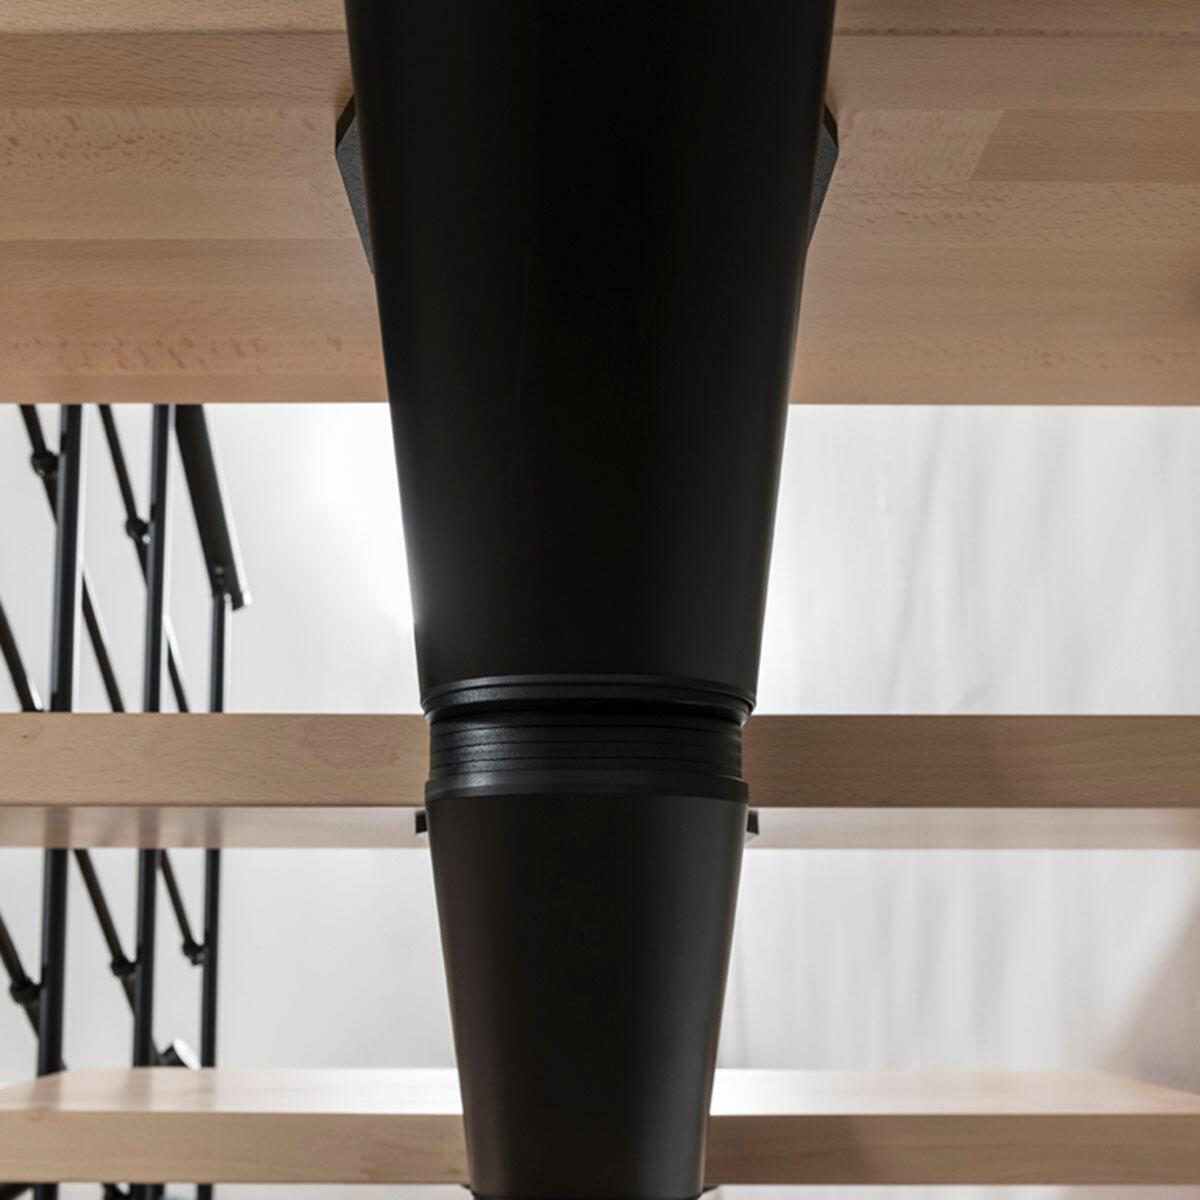 Scala a rampa 1/4 di giro Mas 050 PVC FONTANOT L 75 cm, gradino naturale, struttura nero - 7